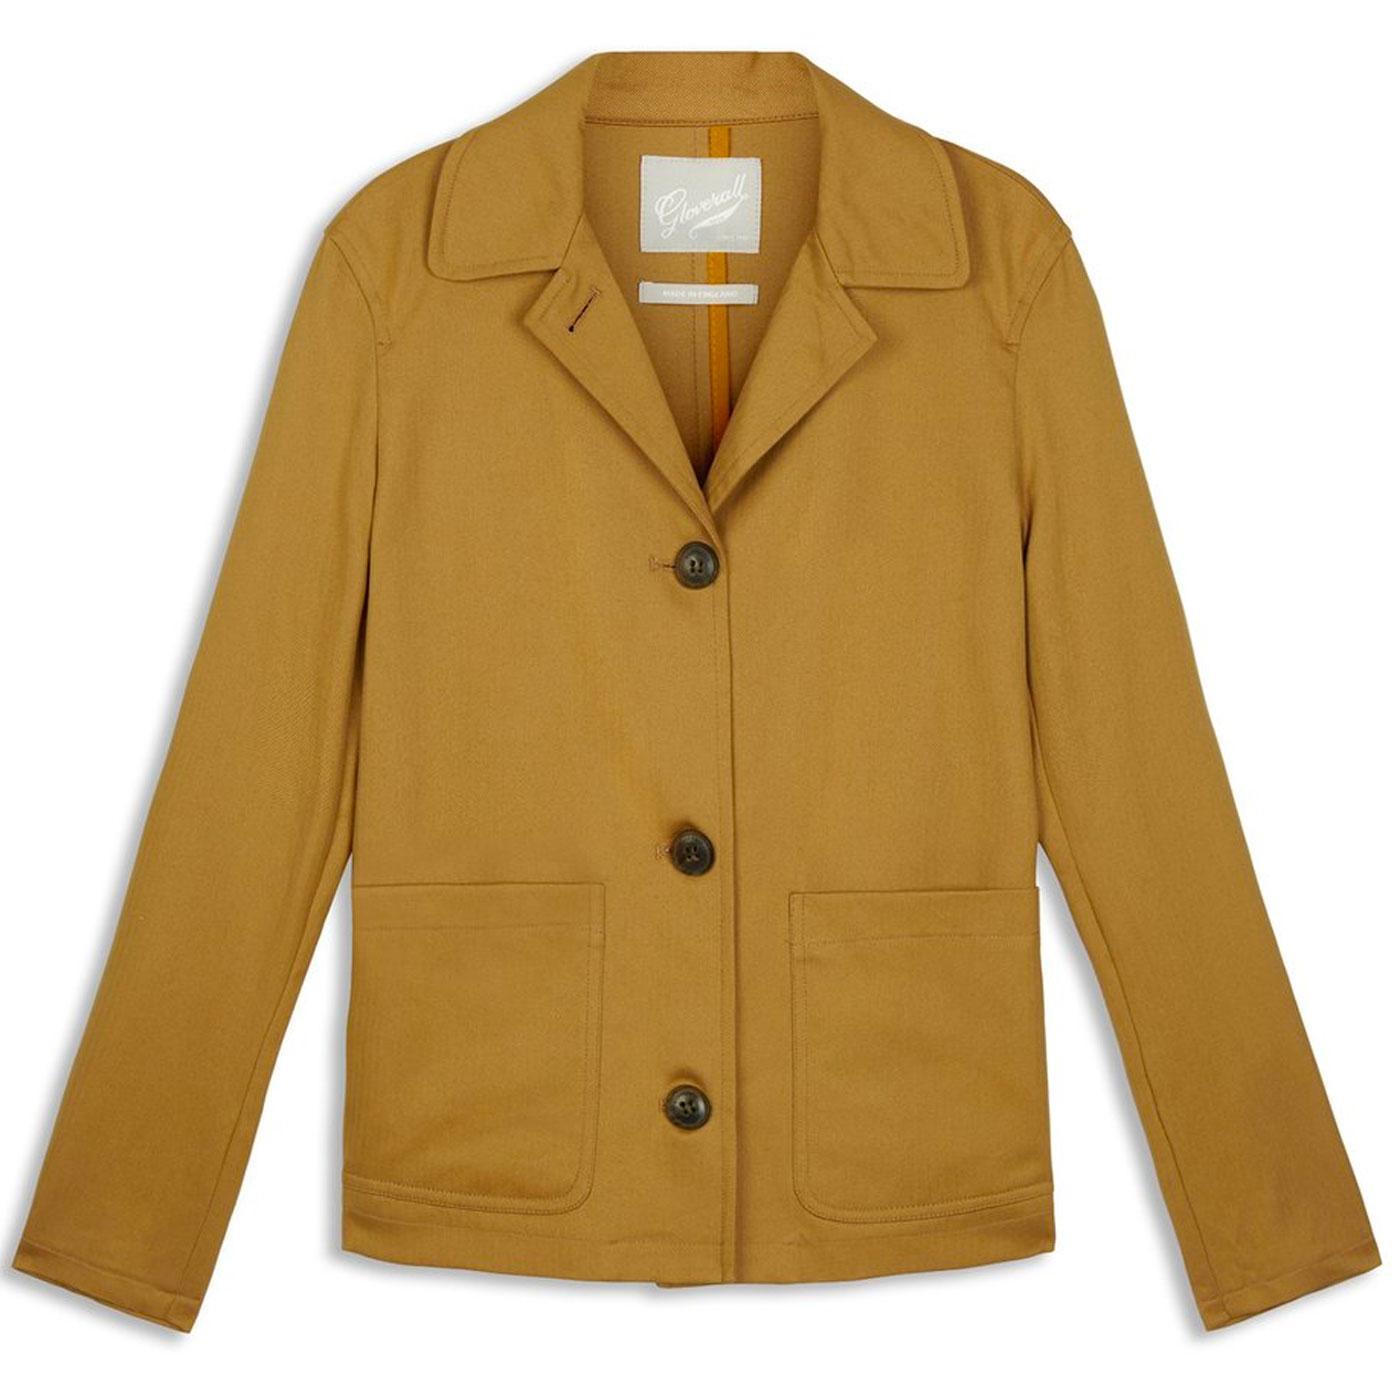 Charlotte GLOVERALL Women's Retro 60s Work Jacket